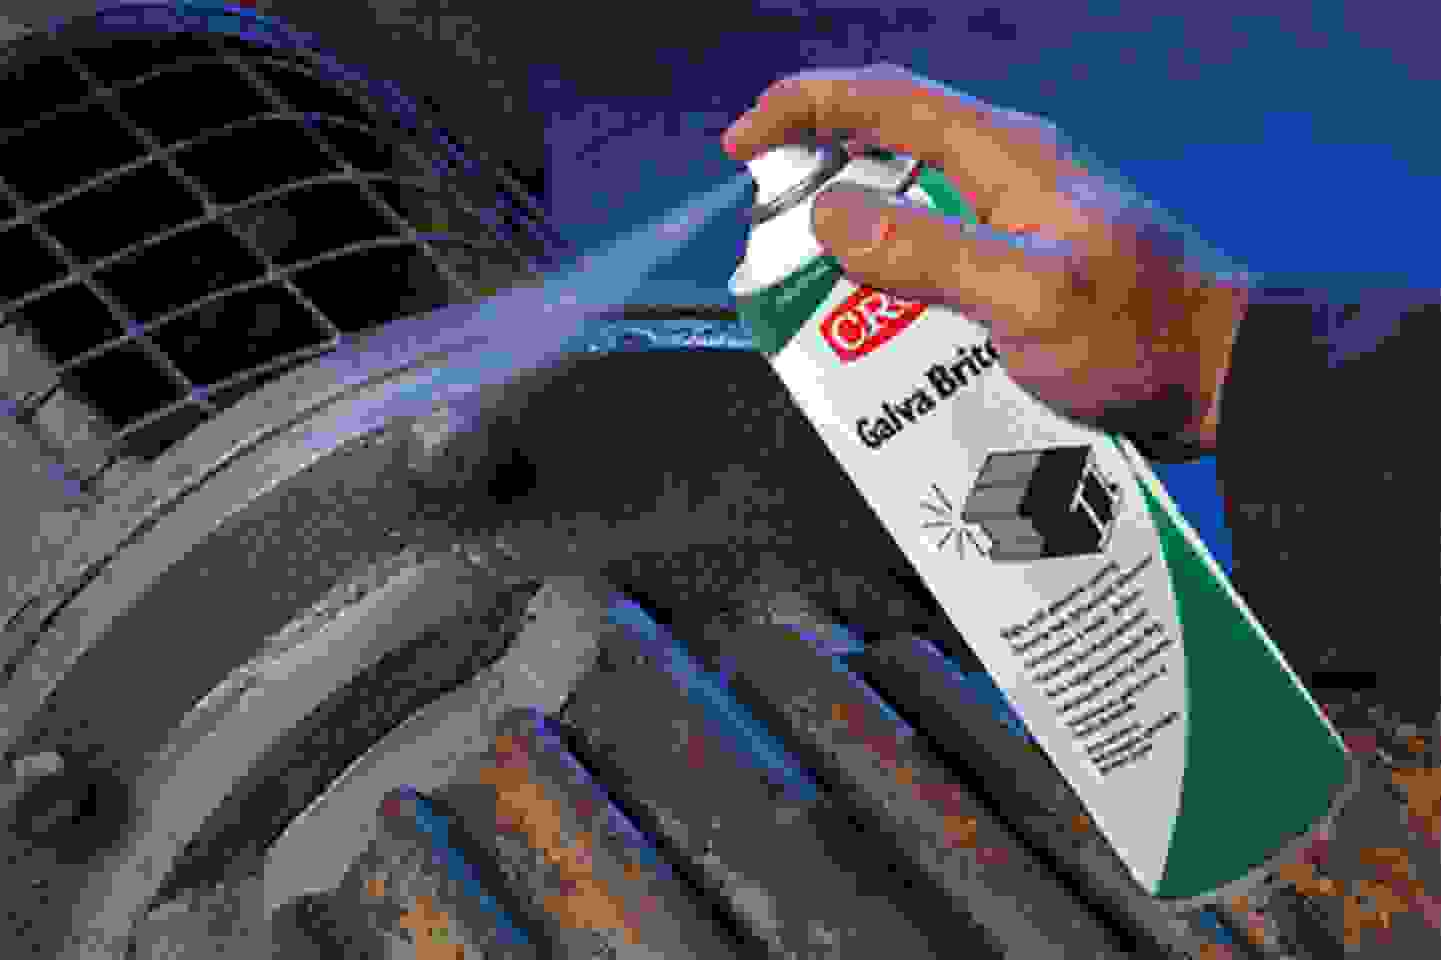 bs-crc-korrosionsschutz-03